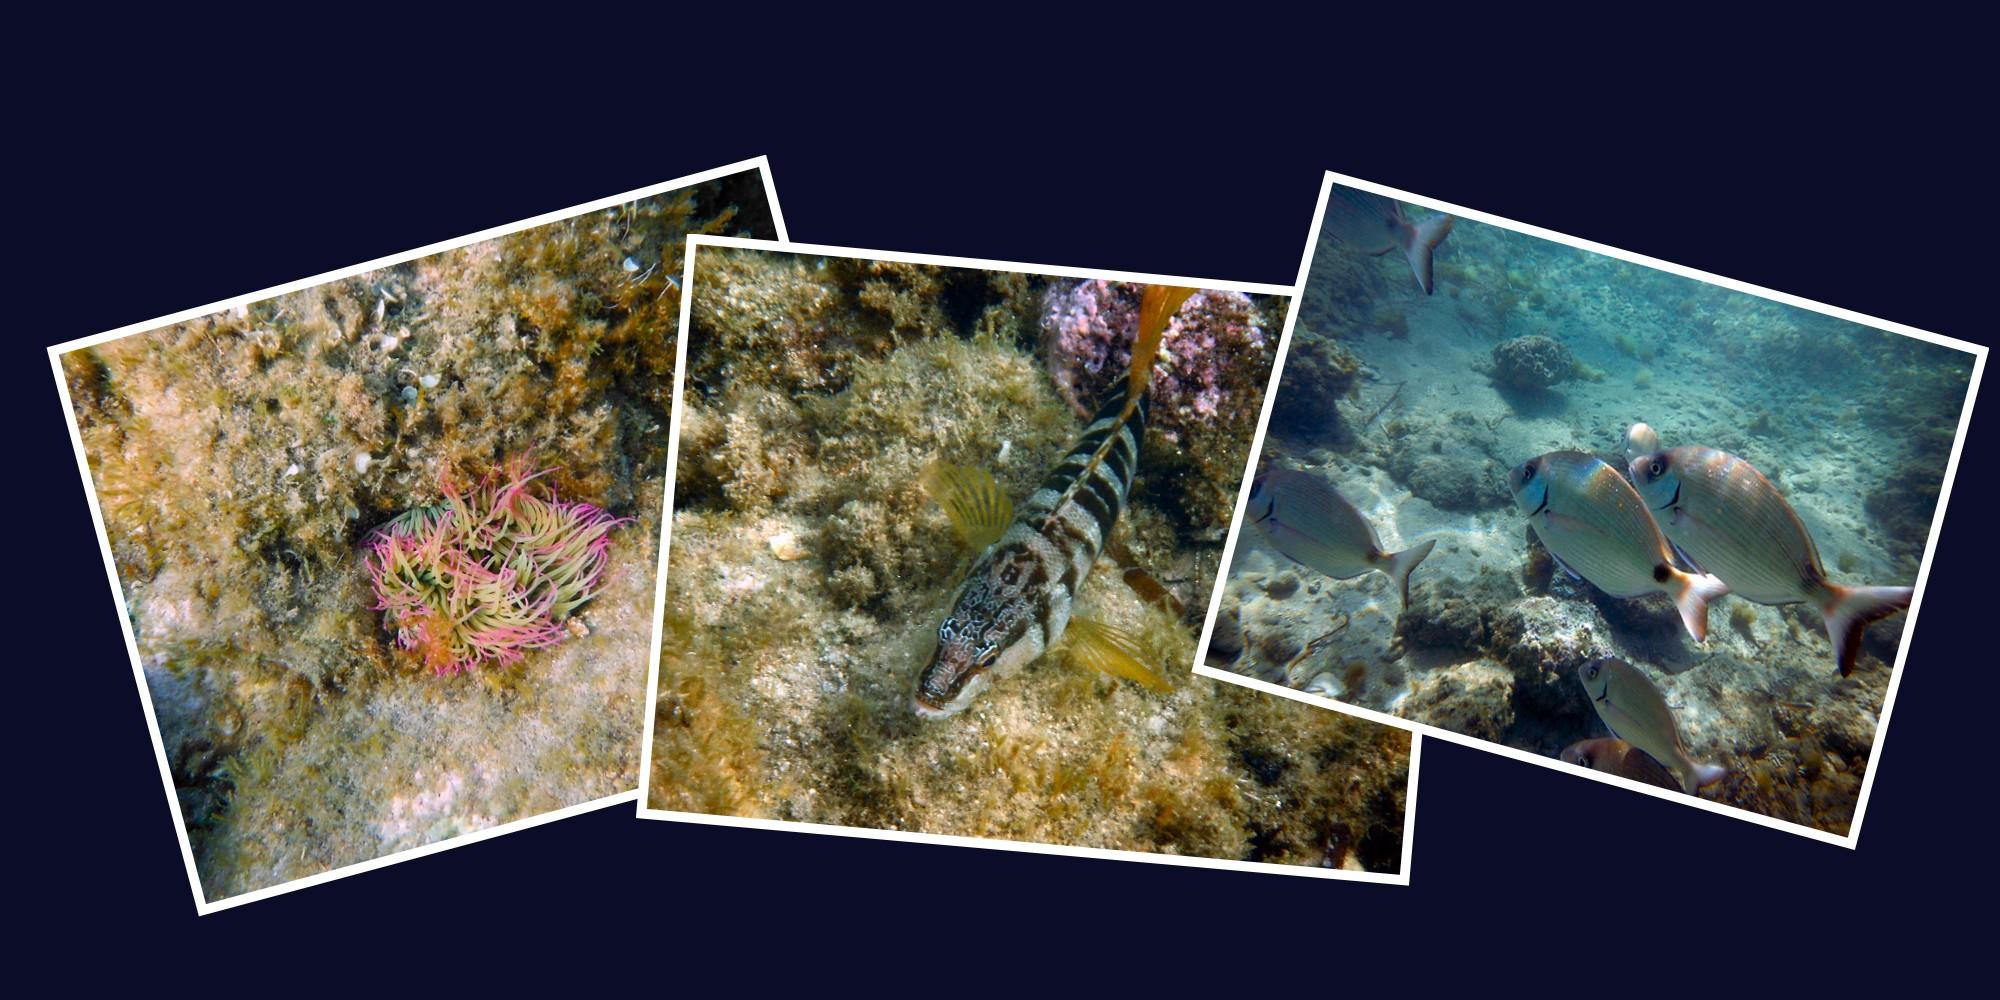 http://ekladata.com/TYcjQkwLdQ09IAmv1dCbwyH3mnY/diapo-snorkeling.jpg